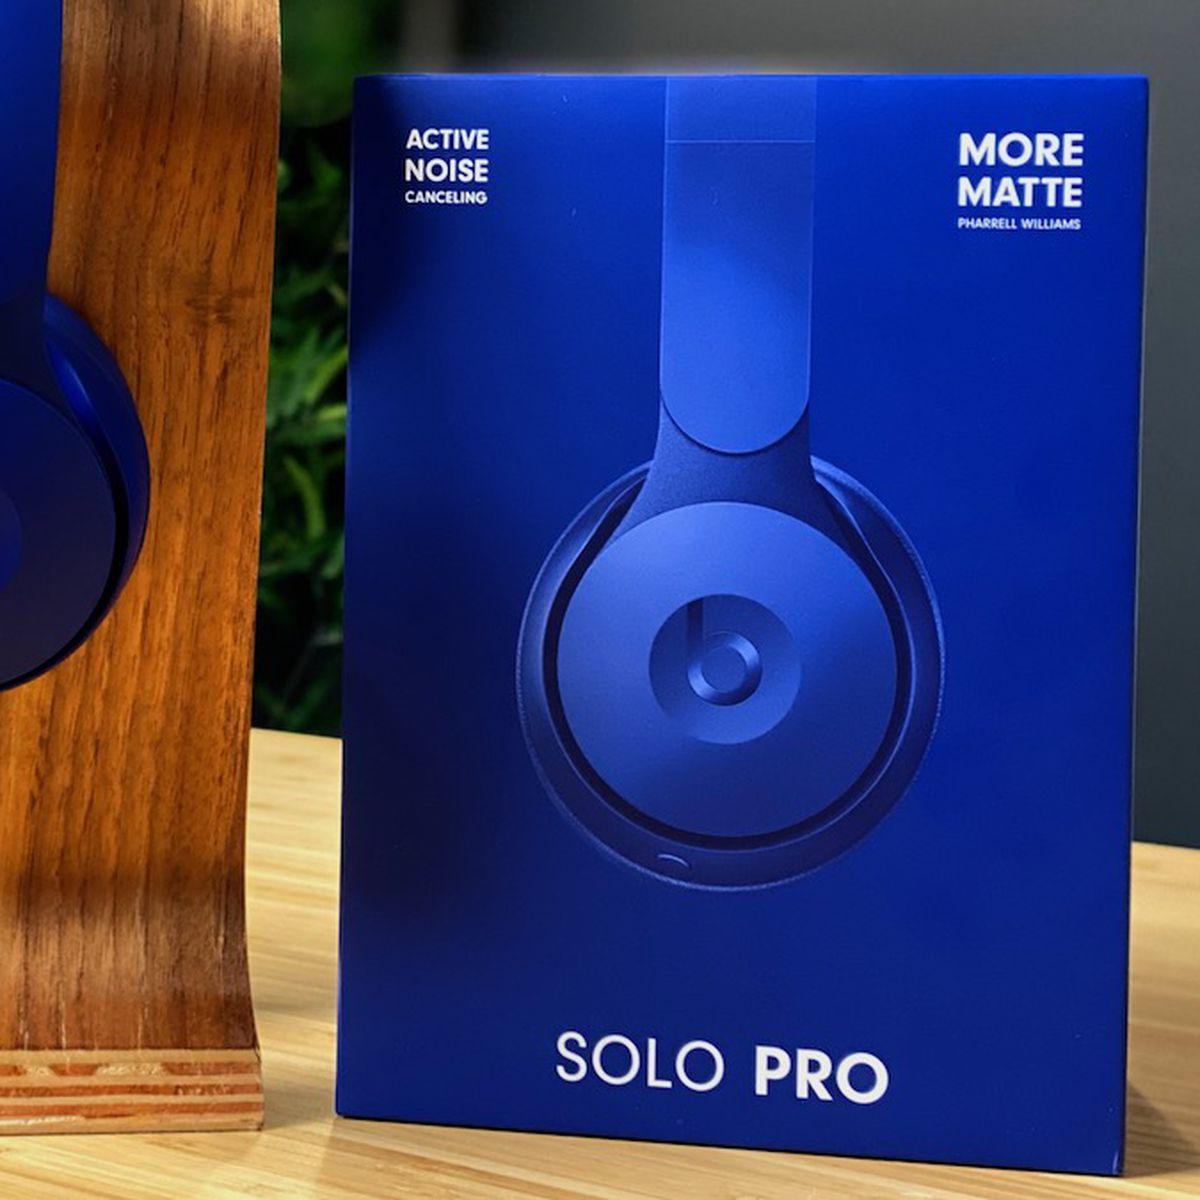 Top Stories Beats Solo Pro Headphones Apple Leaks 16 Inch Macbook Pro 399 Iphone Se 2 And More Macrumors